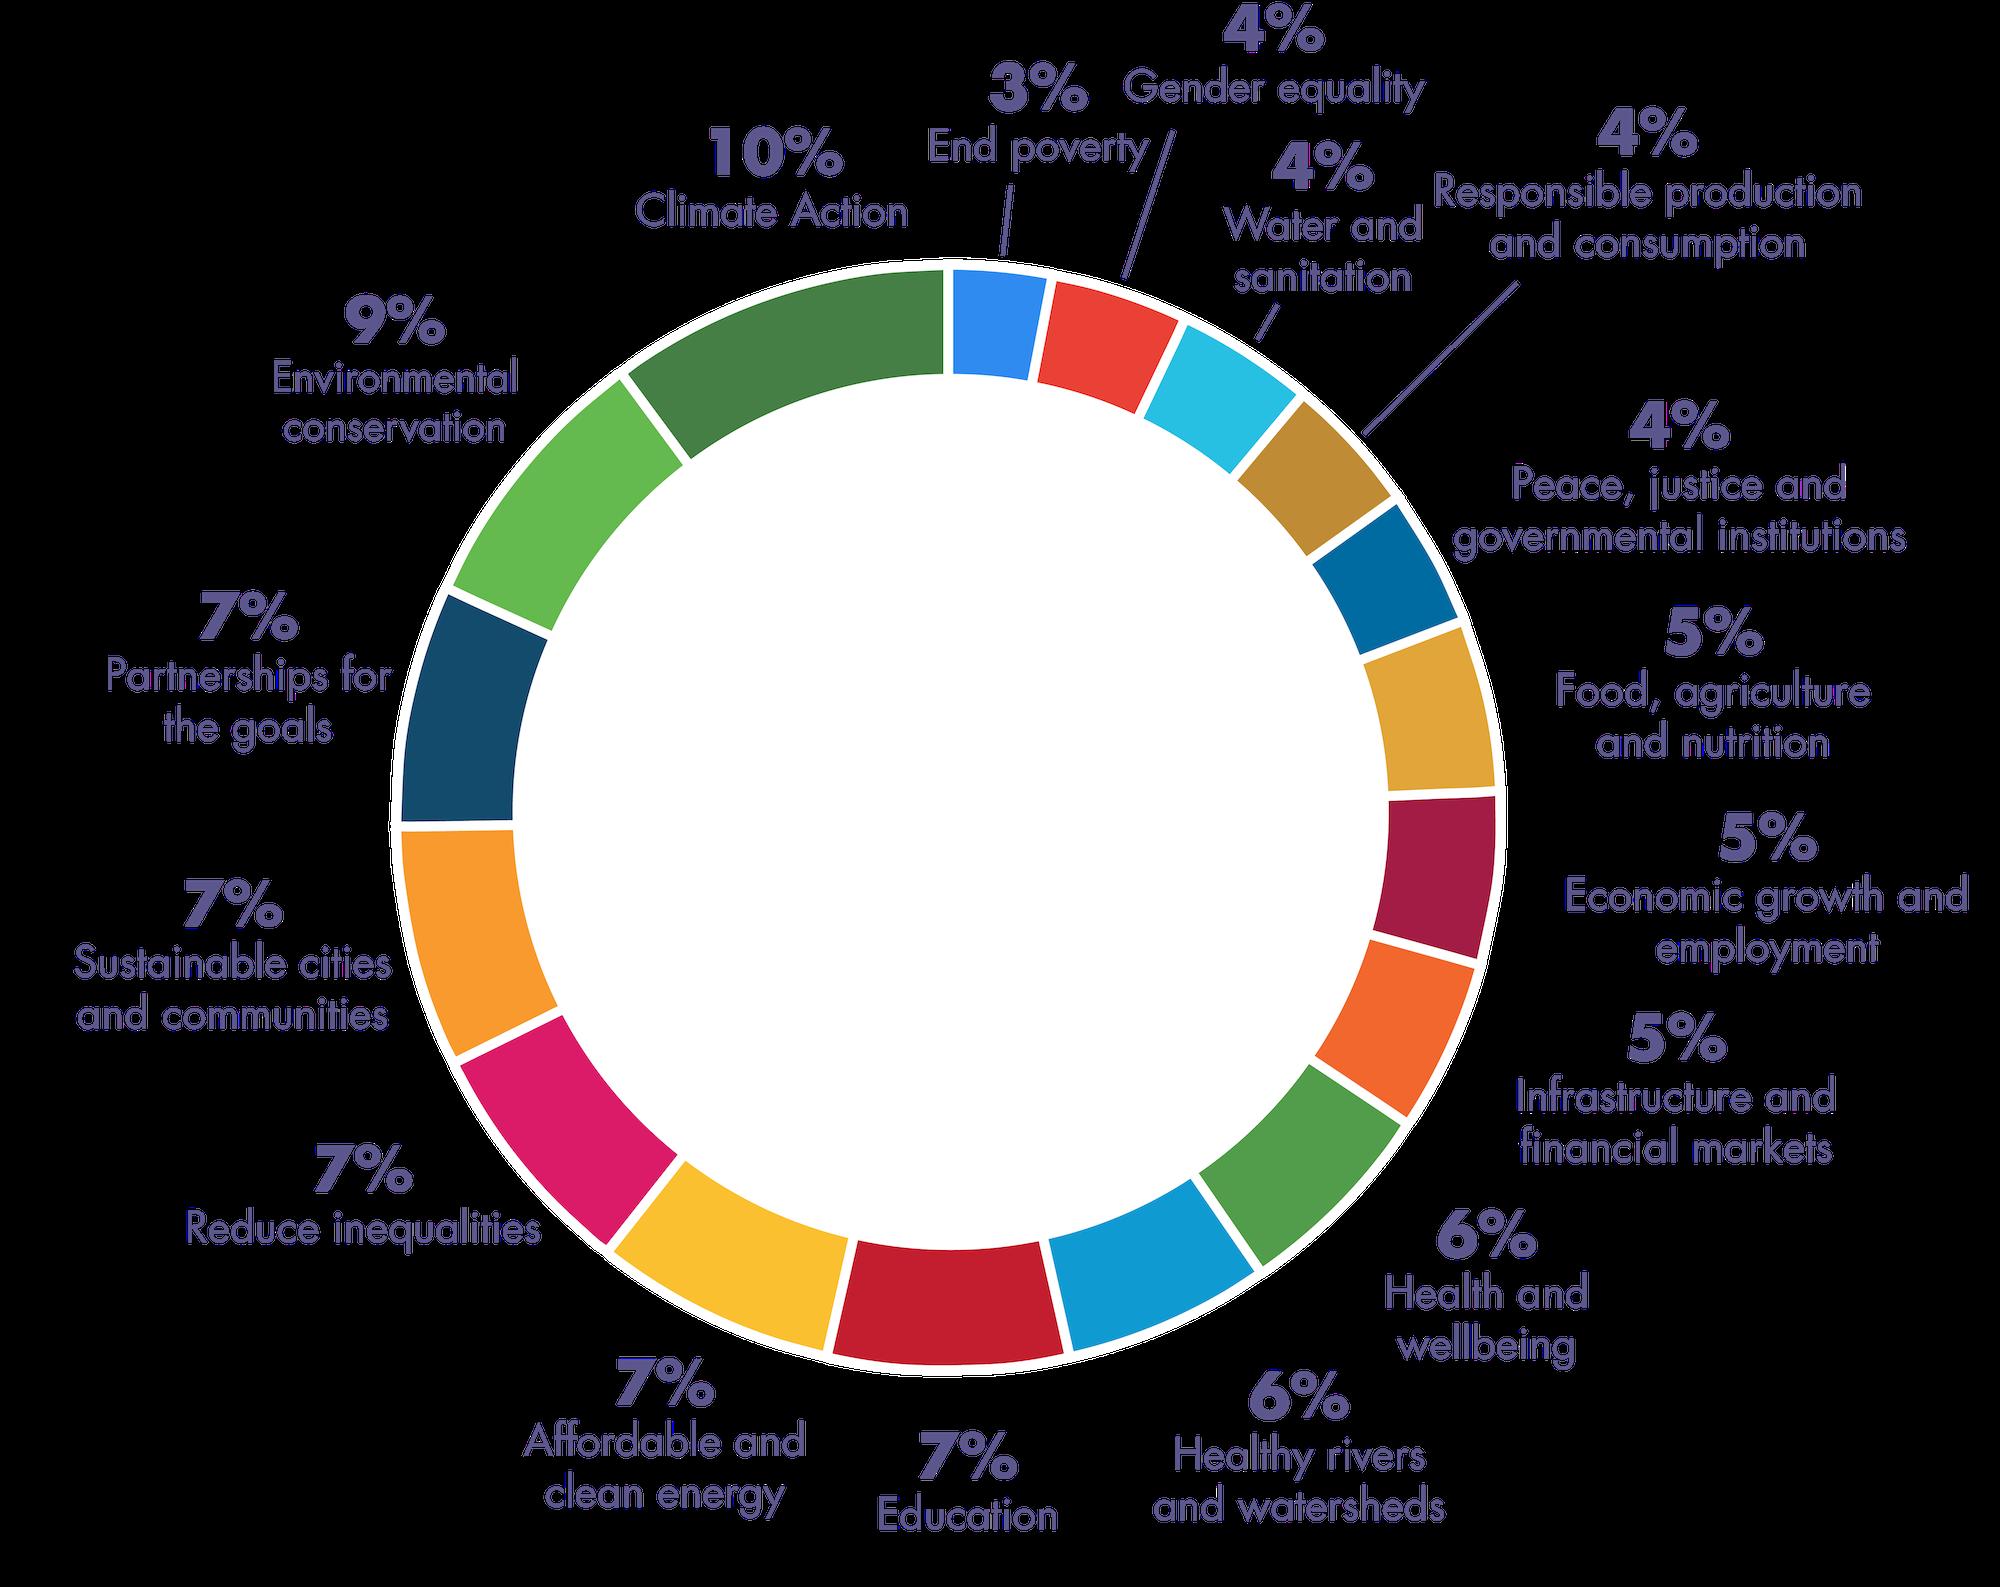 A chart displaying the SDGs that Alliance Center tenants work toward.